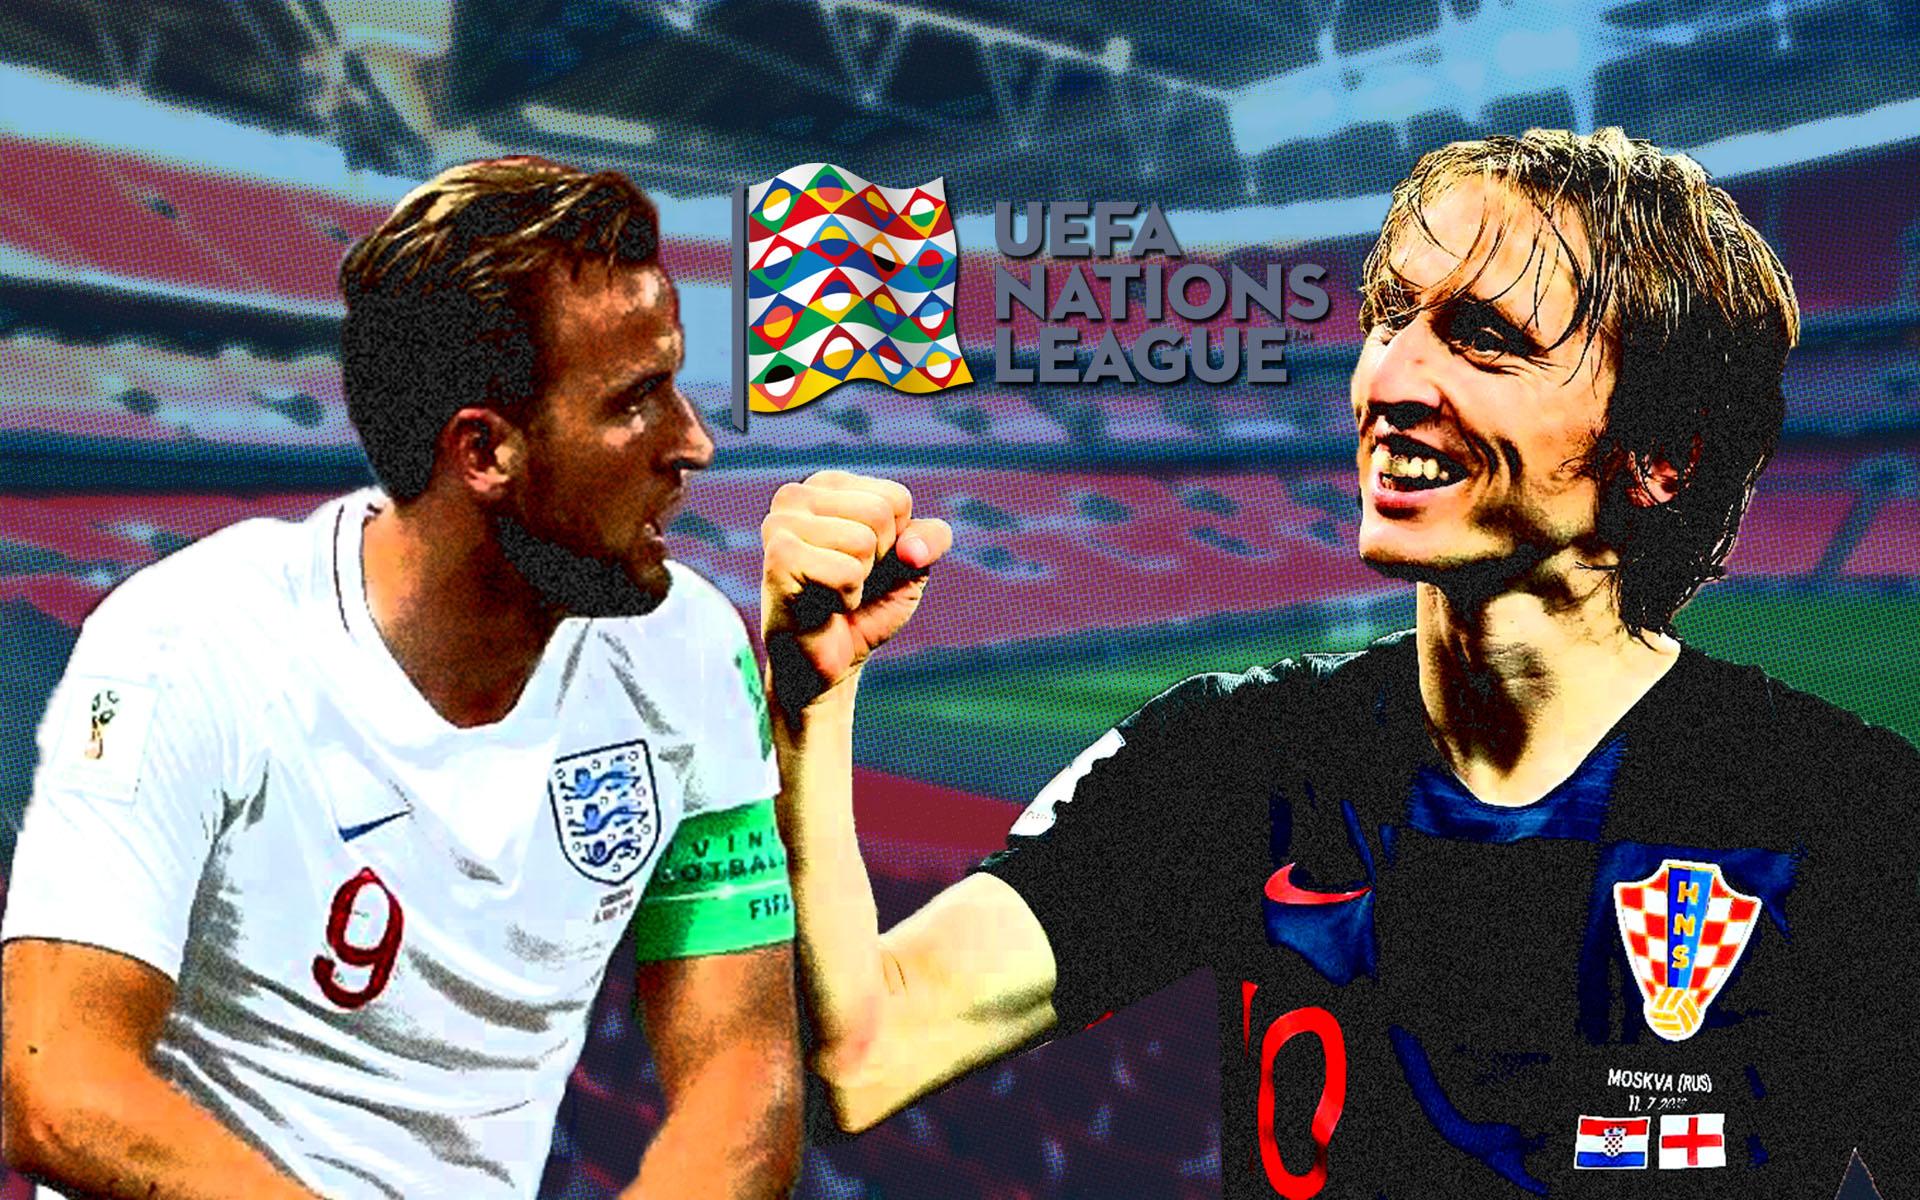 ENGLESKA – HRVATSKA 2:1, Hrvatska ispala iz elite Lige nacija